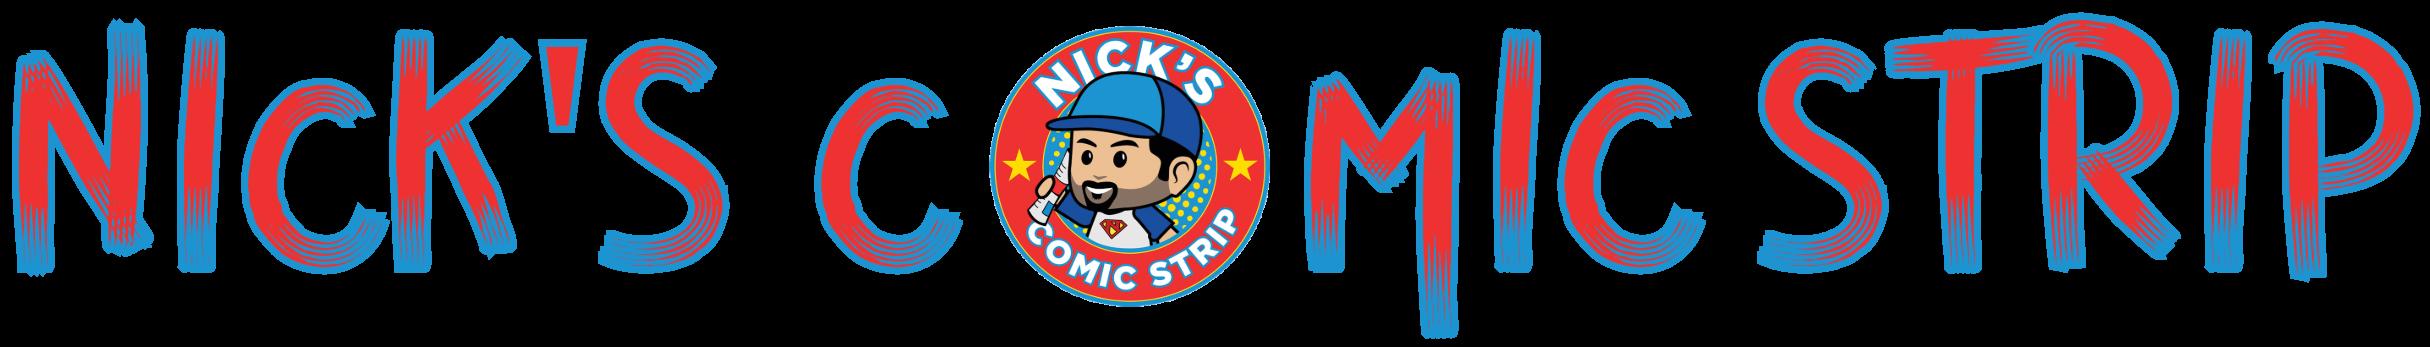 Nick's Comic Strip